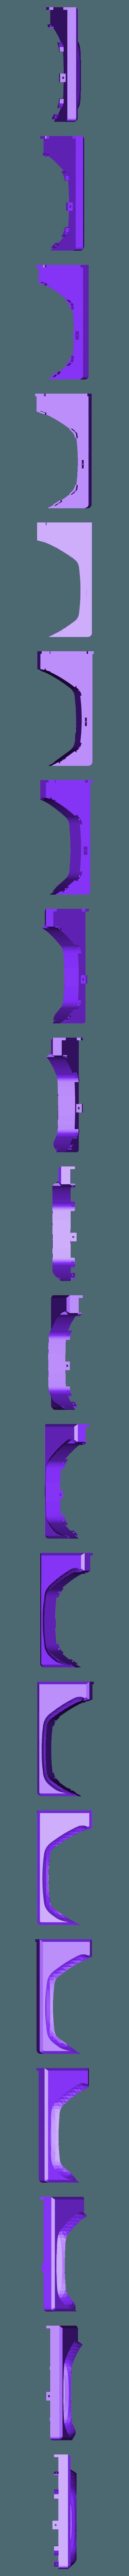 Front fender 002.stl Download free STL file Fender  for Land Rover Defender 110  • Object to 3D print, ildarius2017